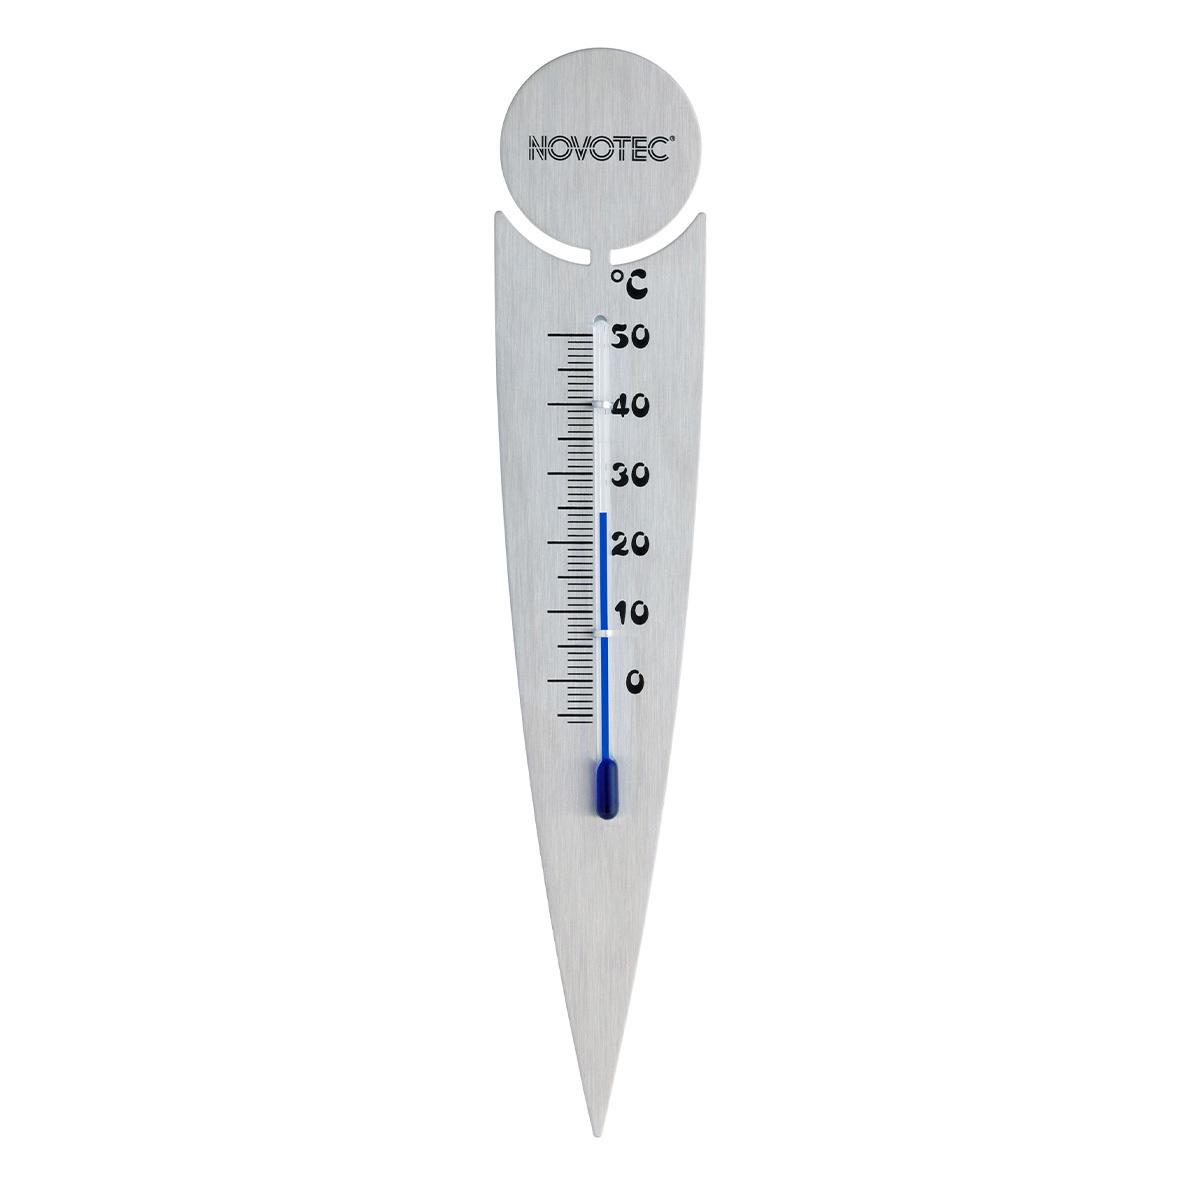 12-2056-60-analoges-blumentopf-thermometer-bloomy-werbedruck-1200x1200px.jpg